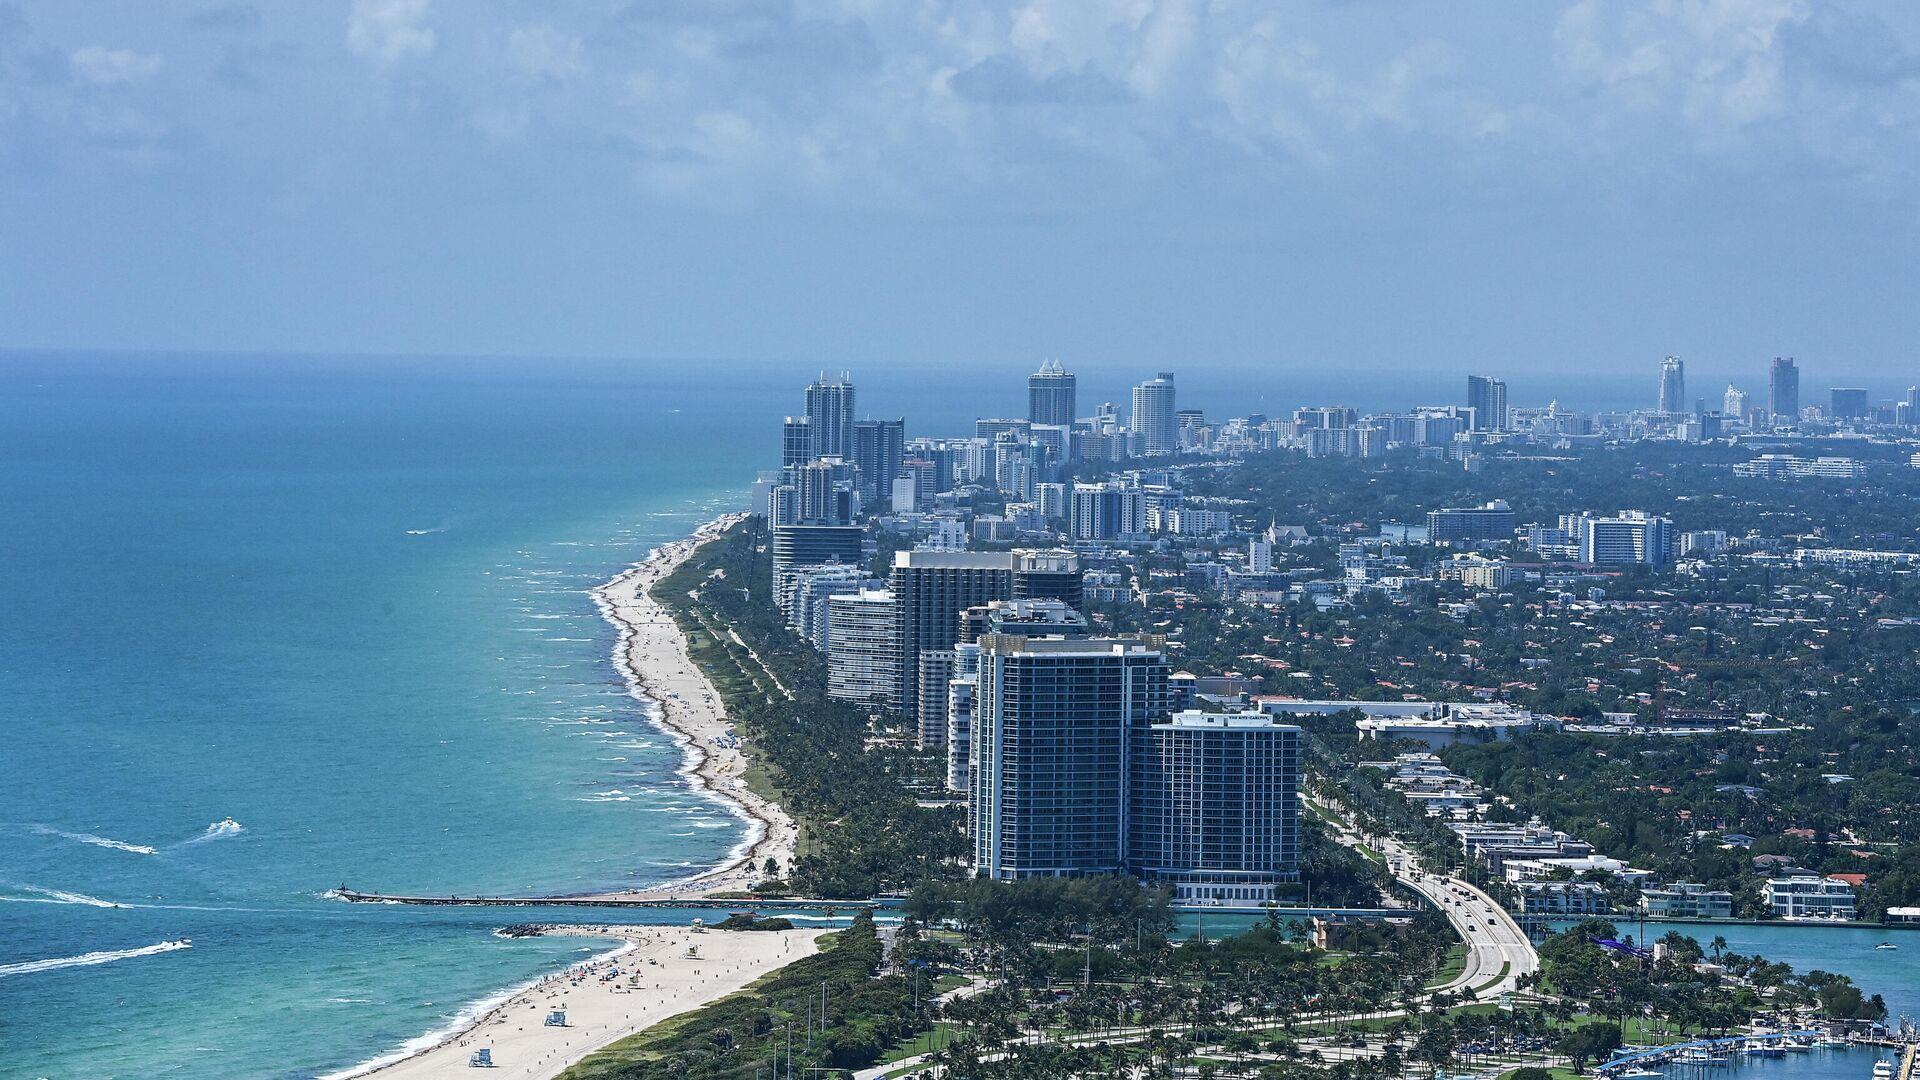 Vista aerea de North Miami Beach, EEUU - Sputnik Mundo, 1920, 02.07.2021